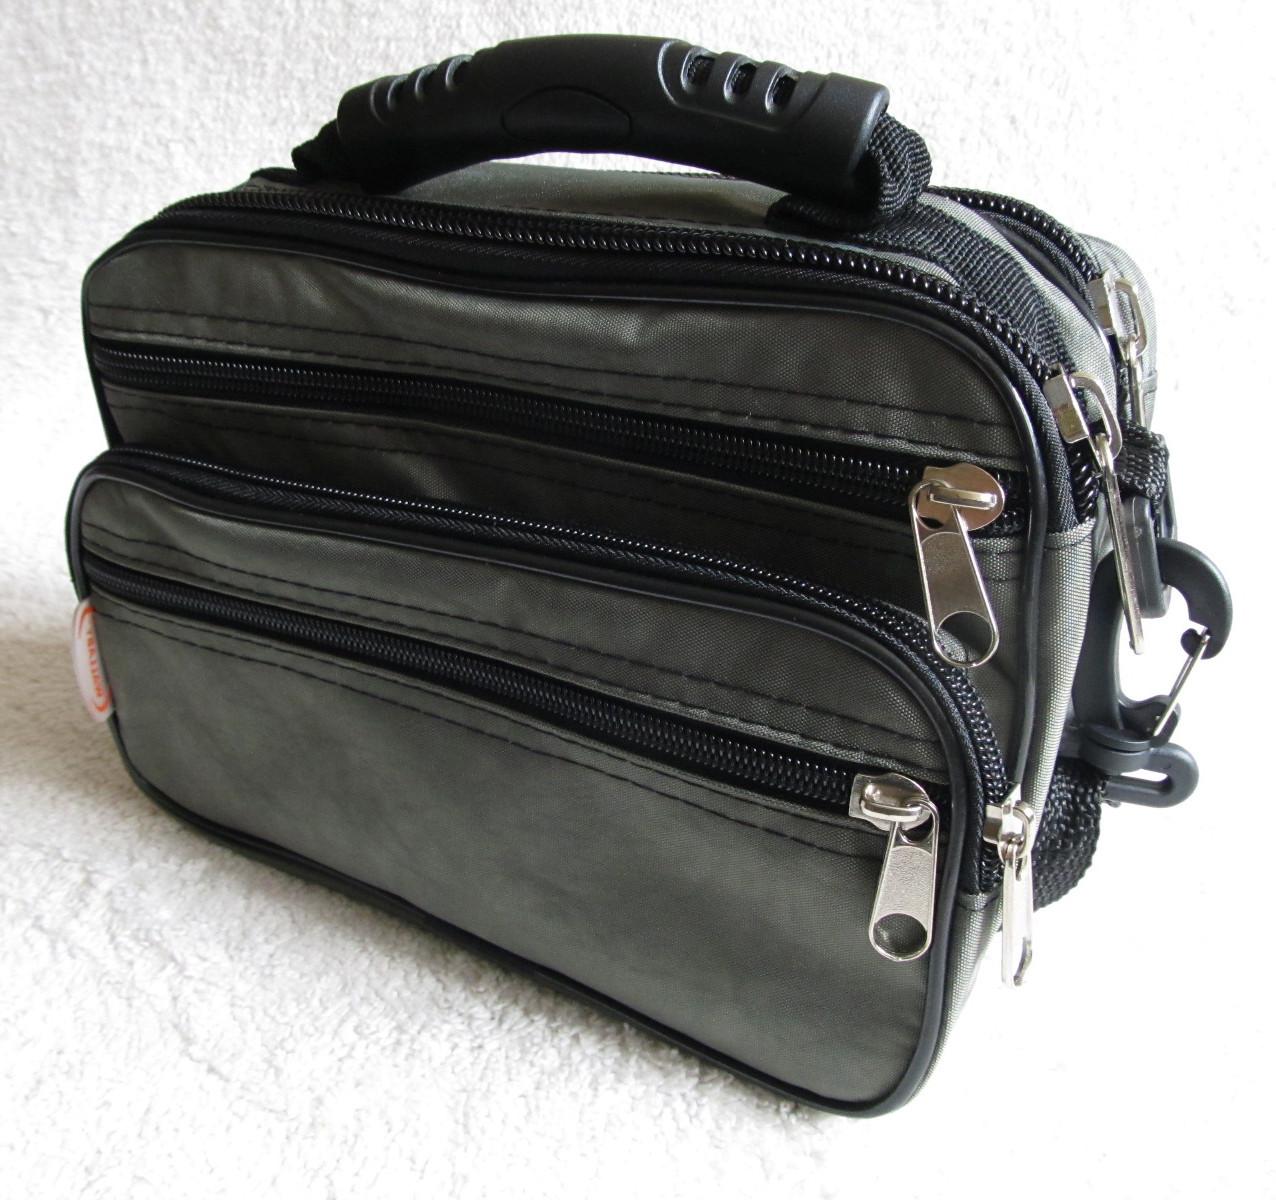 c2fbb4e481dc Мужская сумка Wallaby21231 хаки барсетка через плечо 24х16х13см -  Интернет-магазин